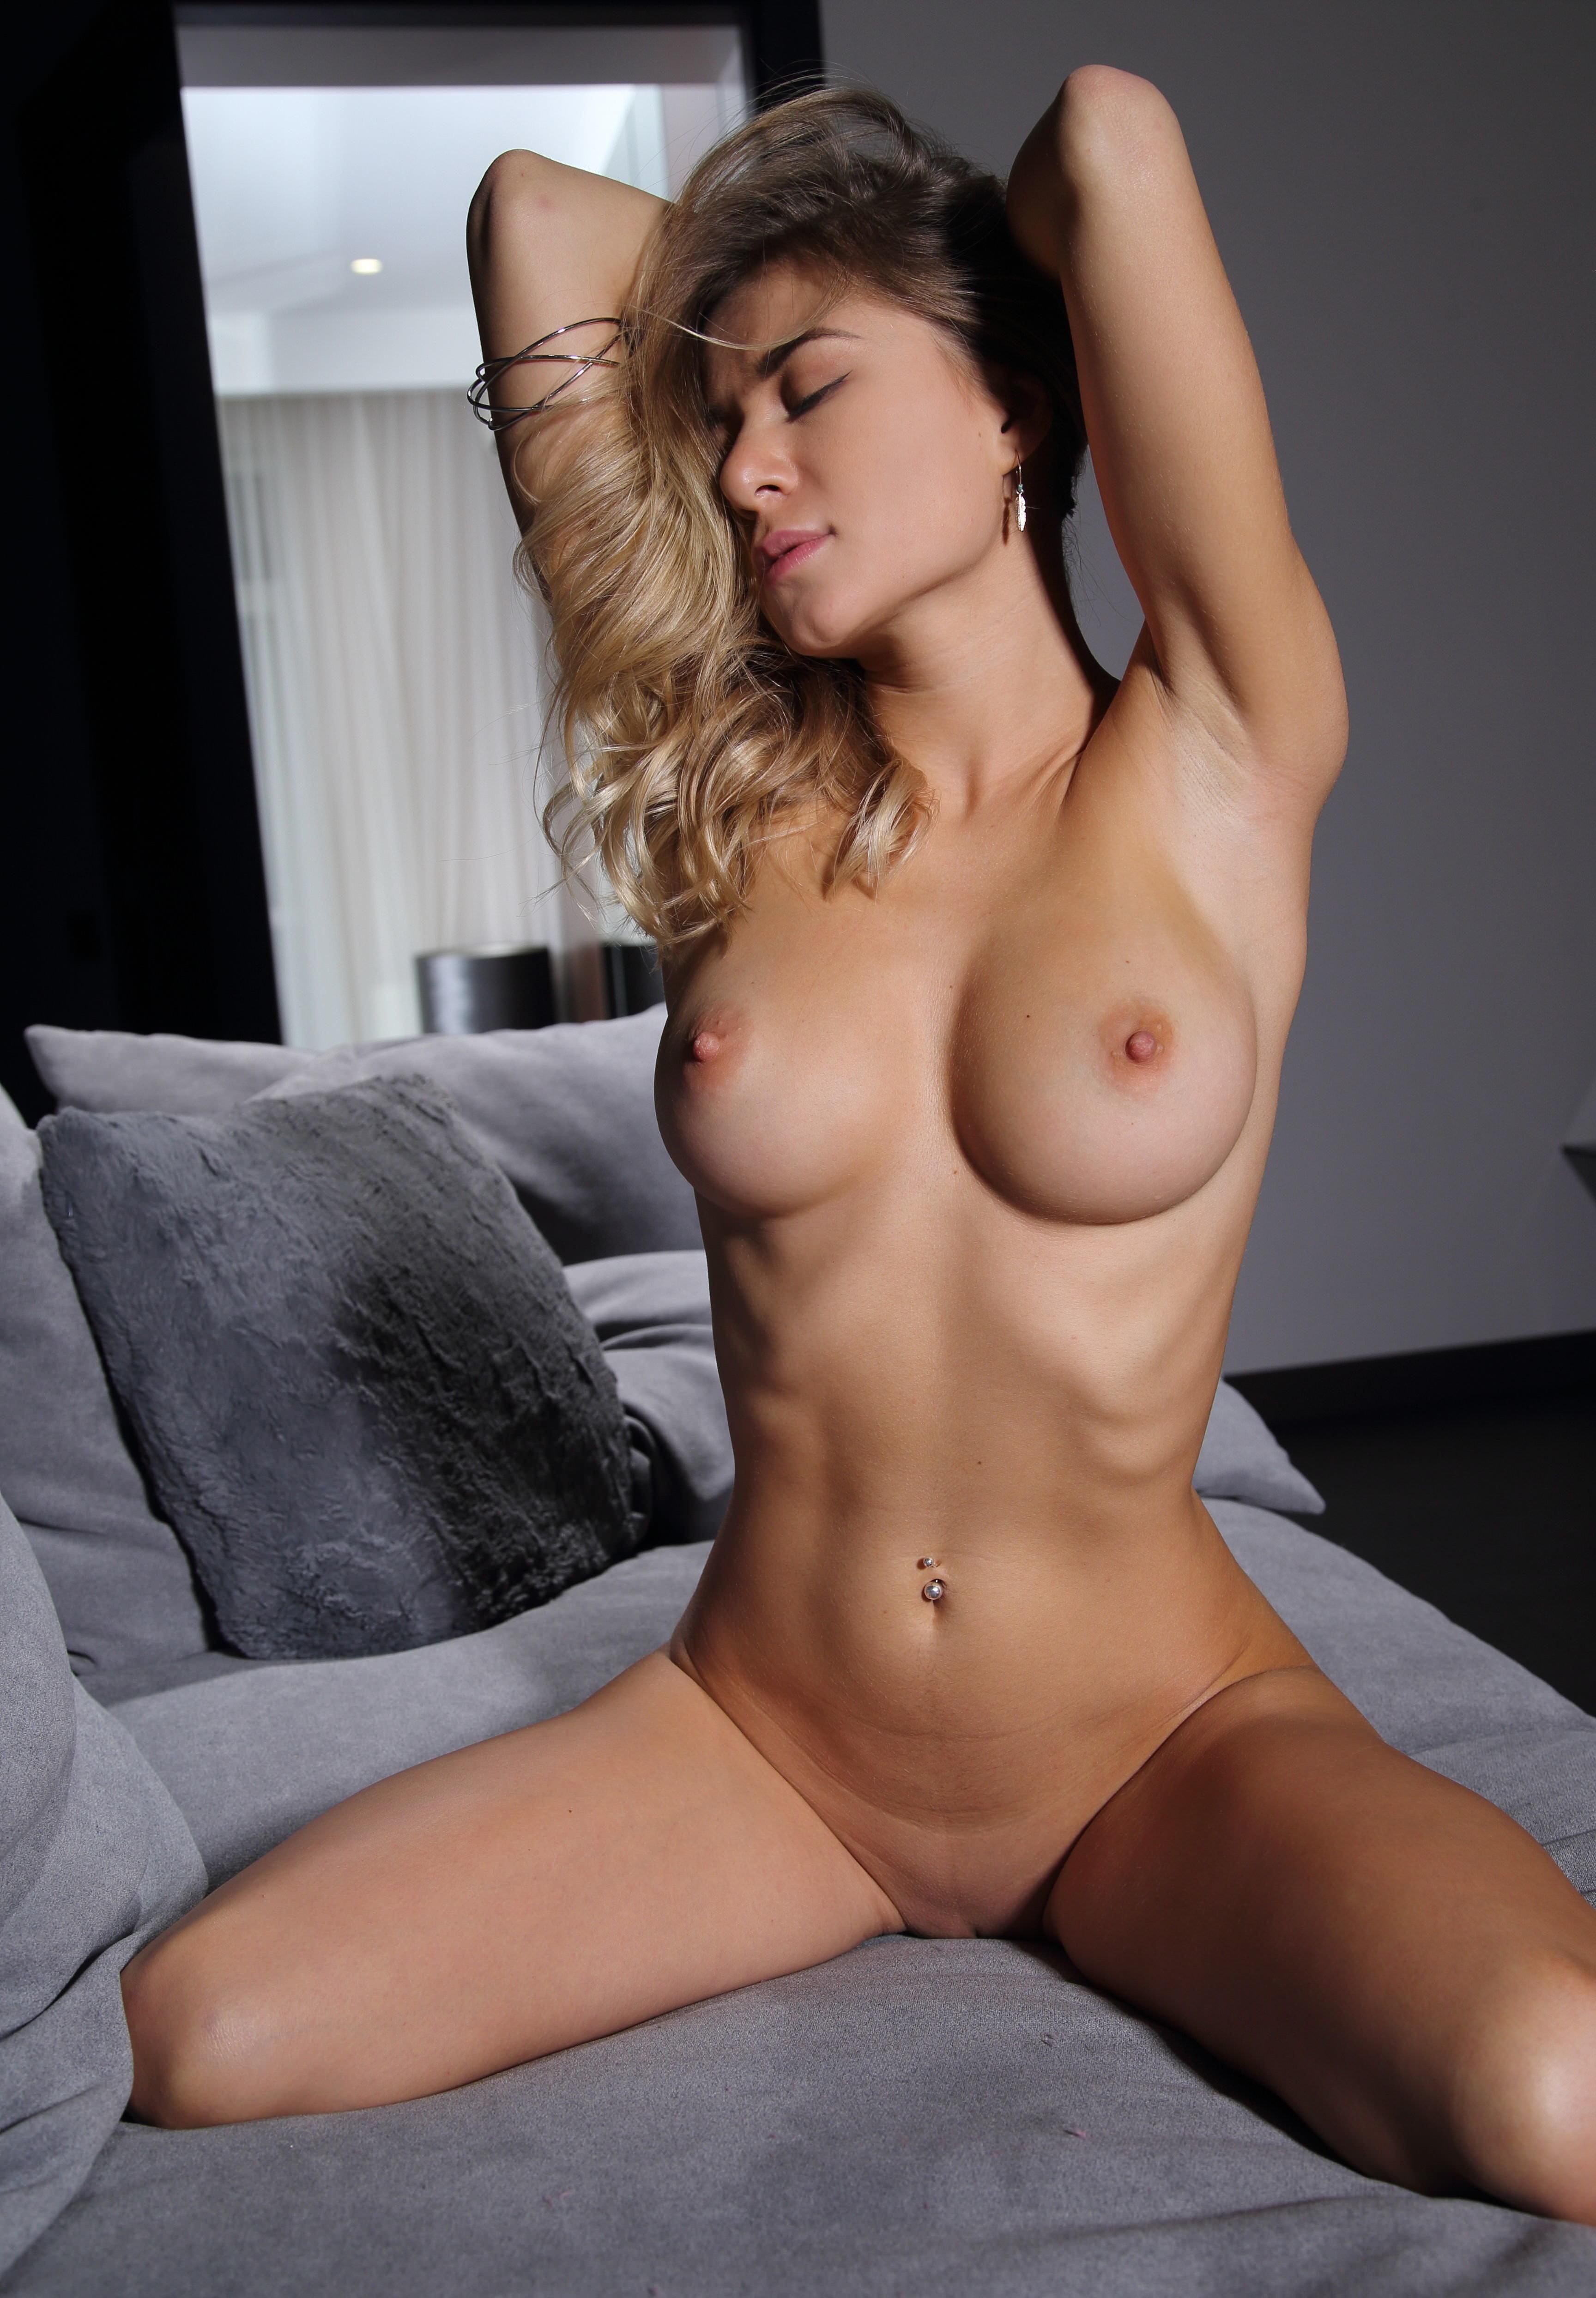 candice b porn